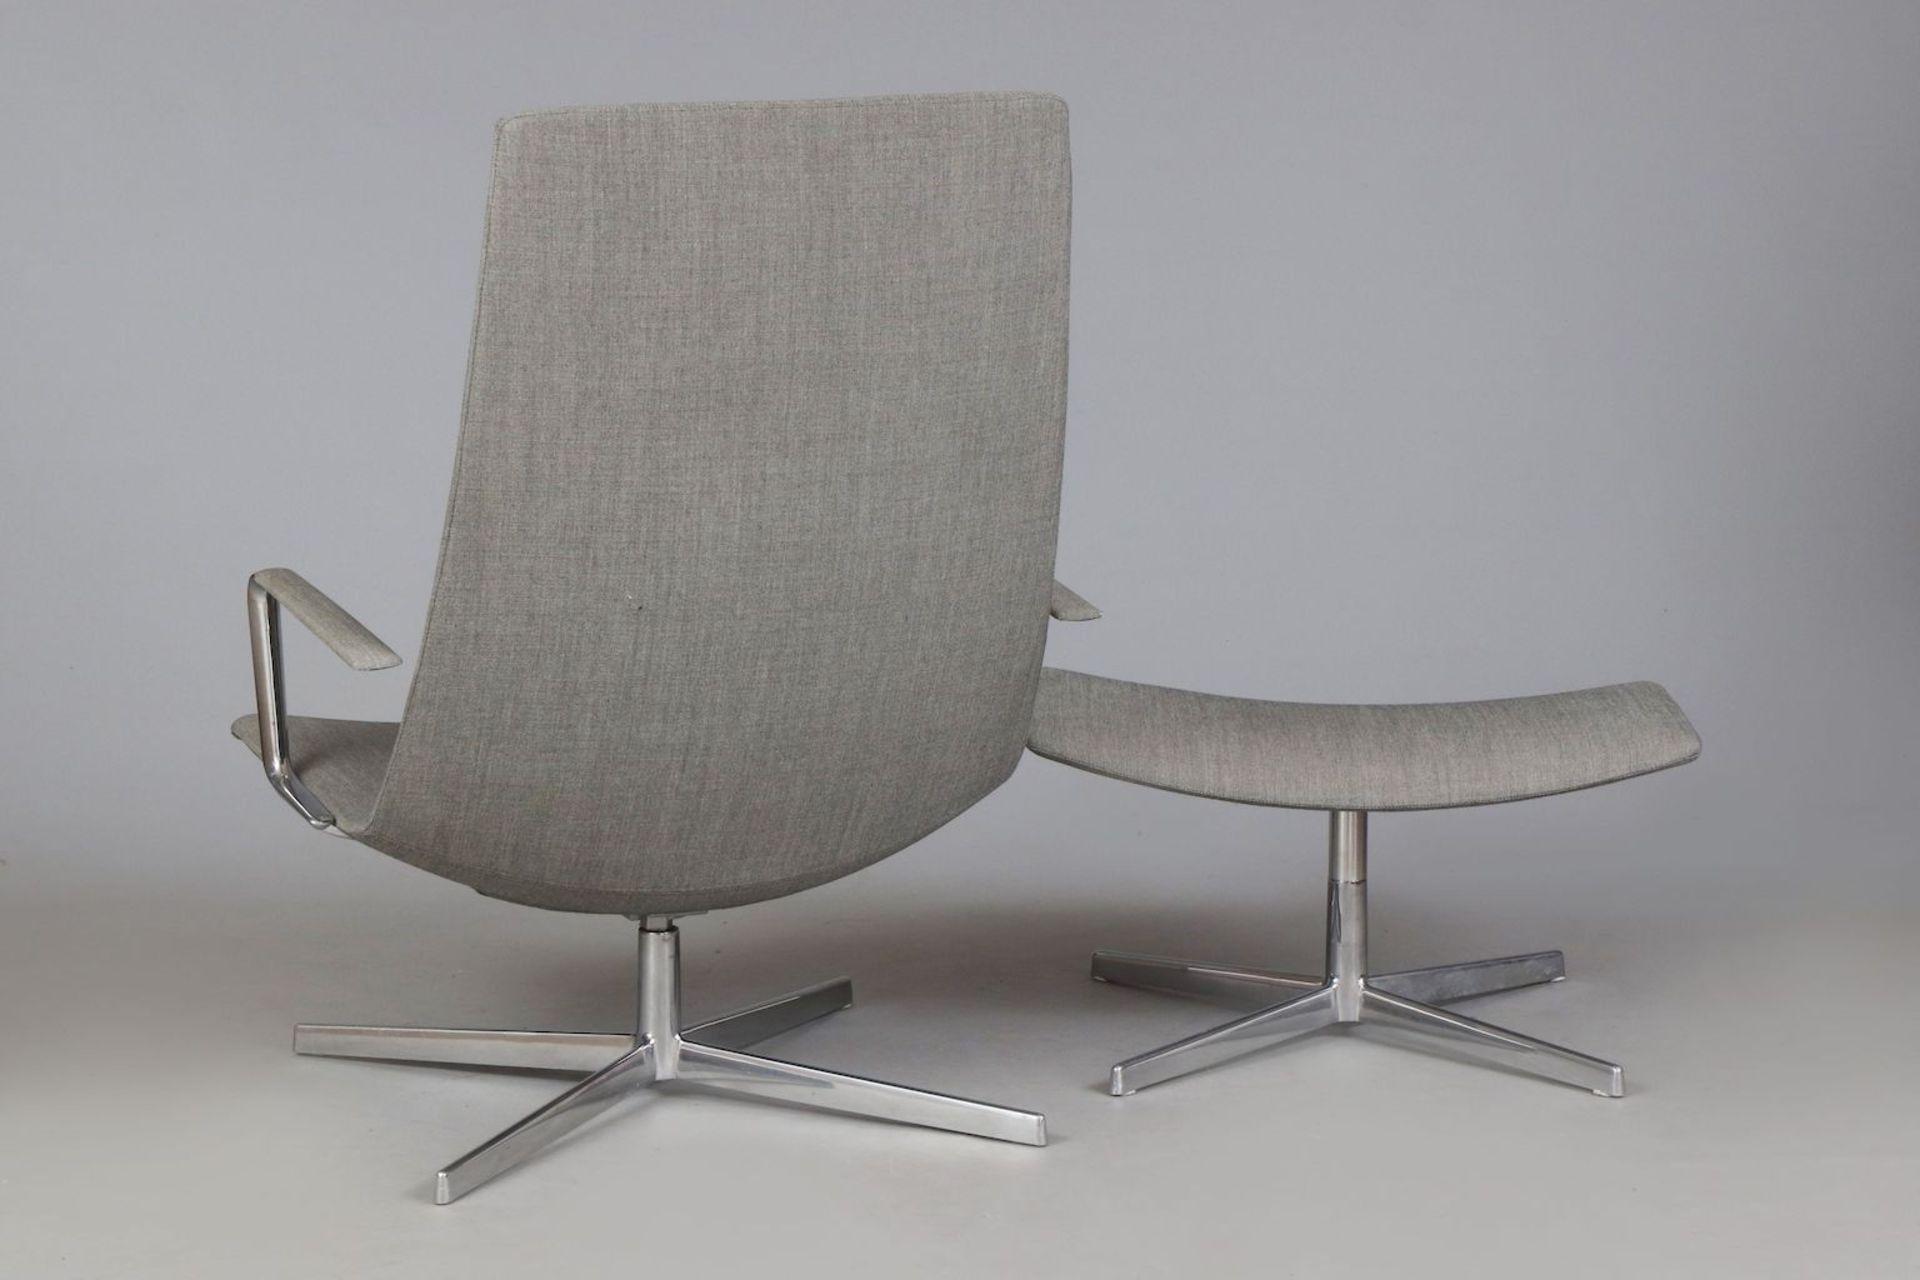 ARPER Italia ¨Catifa 70¨ Lounge chair mit Ottomane - Image 3 of 5